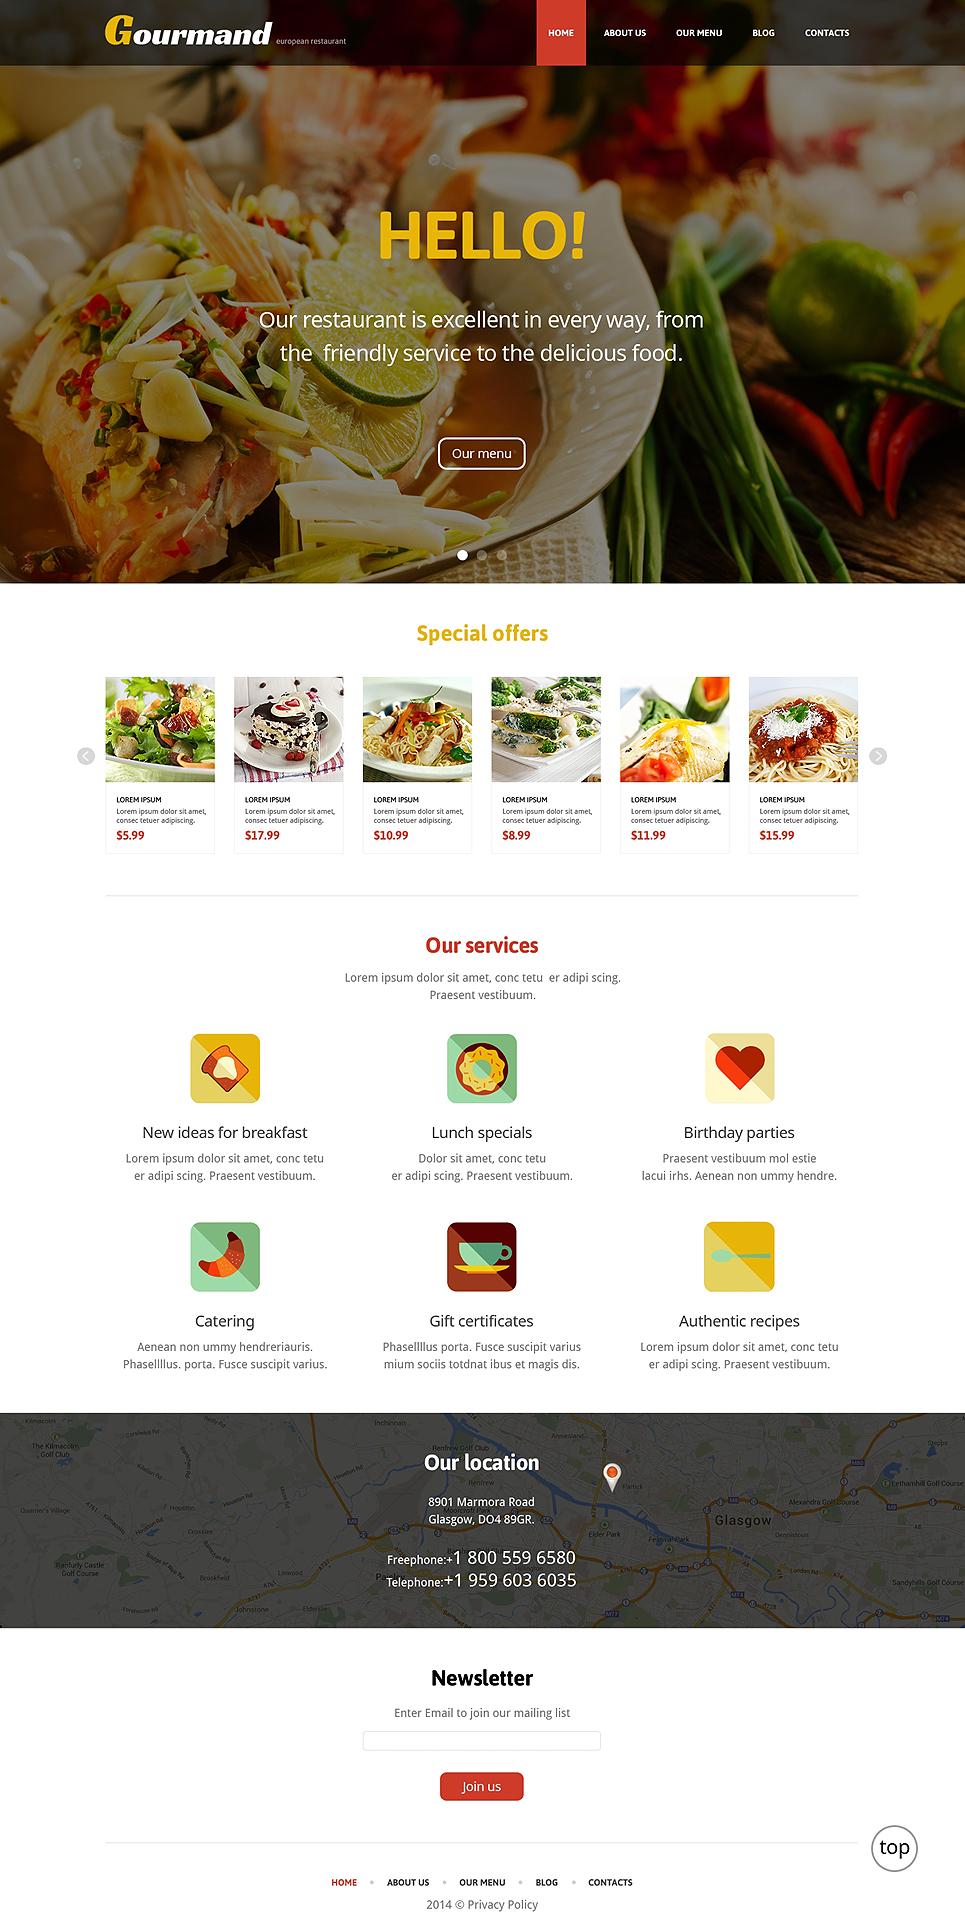 Адаптивный шаблон сайта на тему европейский ресторан #47709